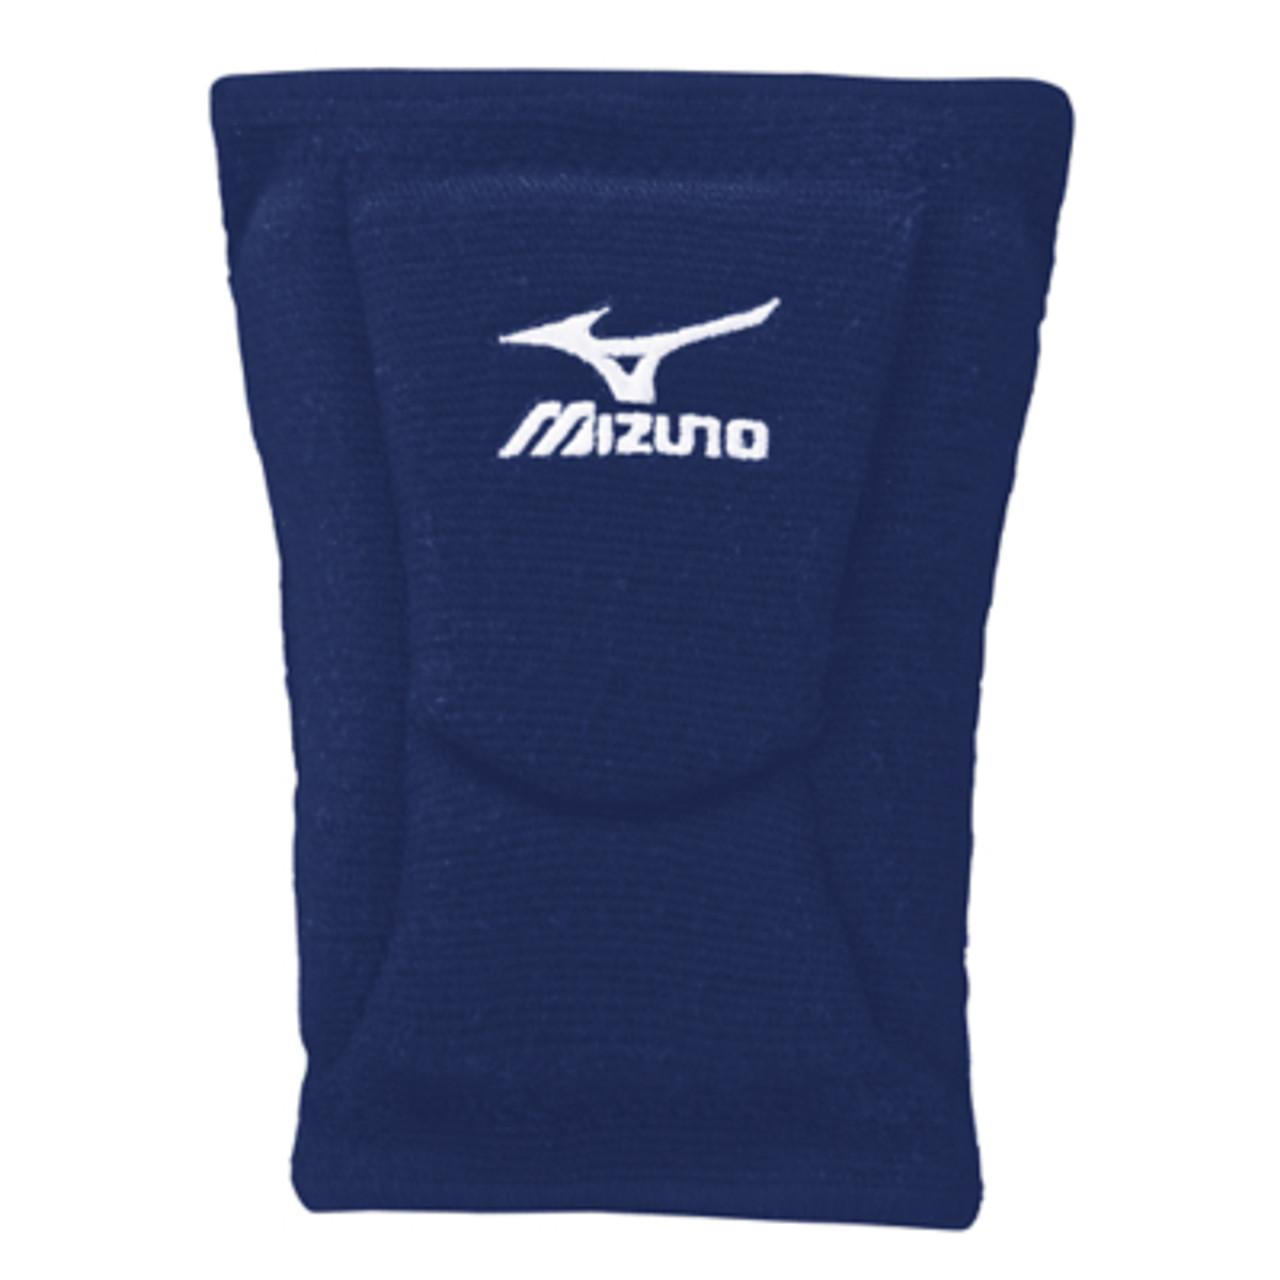 mizuno volleyball for sale